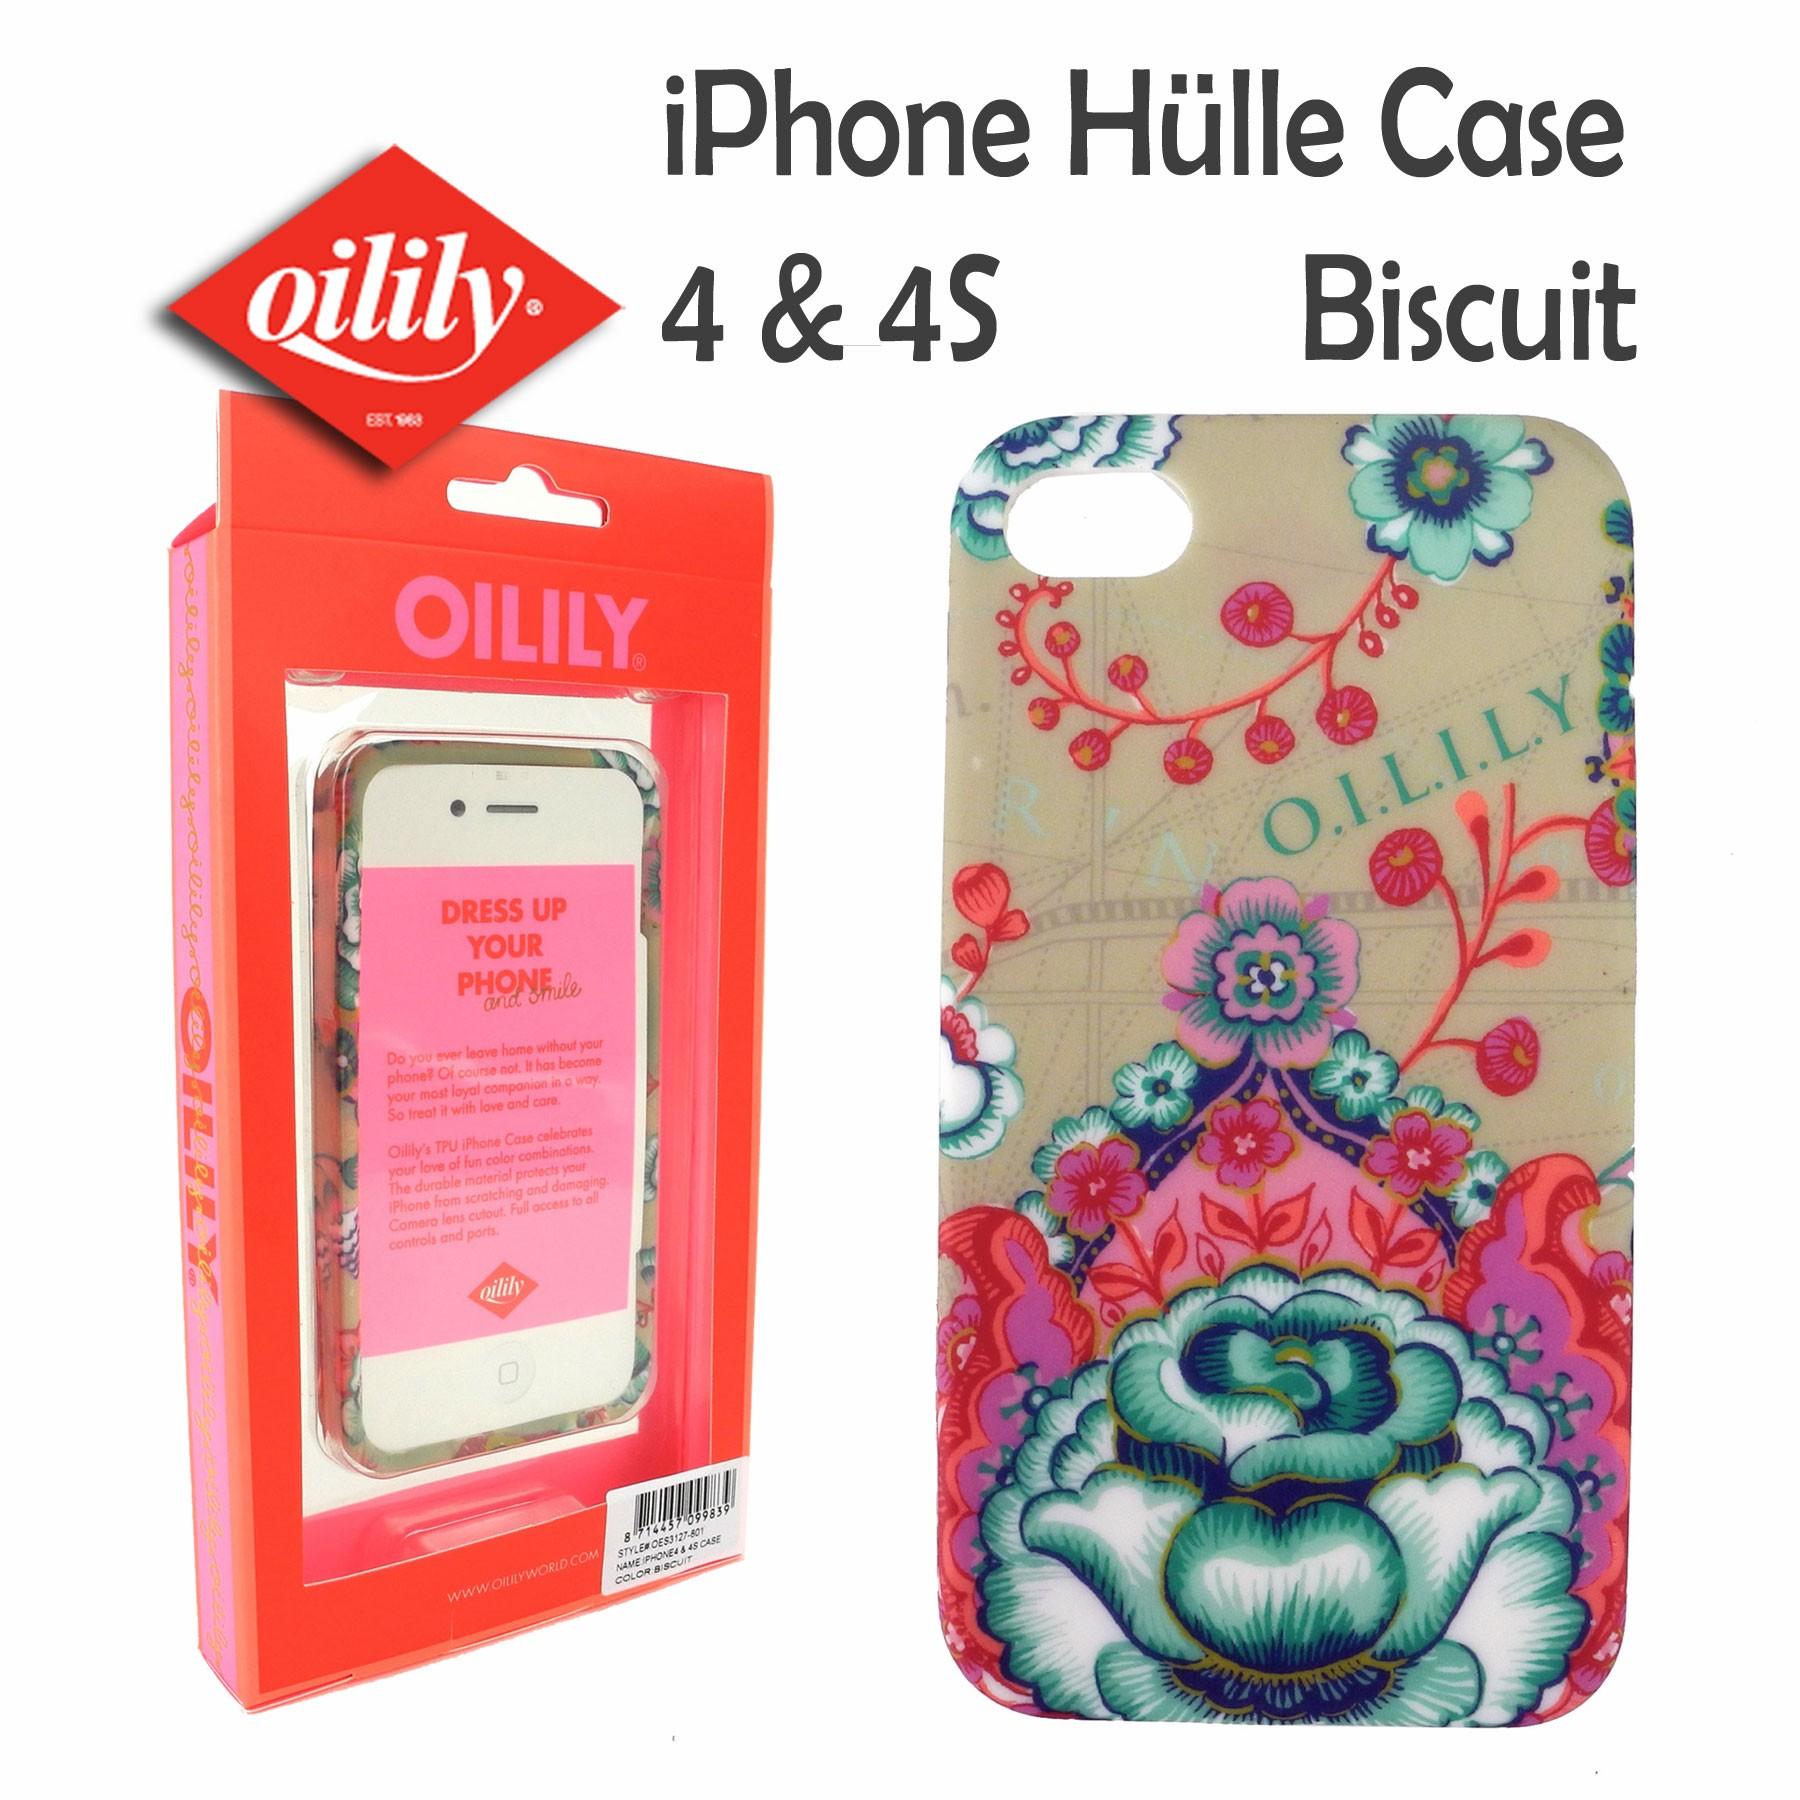 iphone 4 4s h lle von oilily case tpu hardcase fantasy. Black Bedroom Furniture Sets. Home Design Ideas